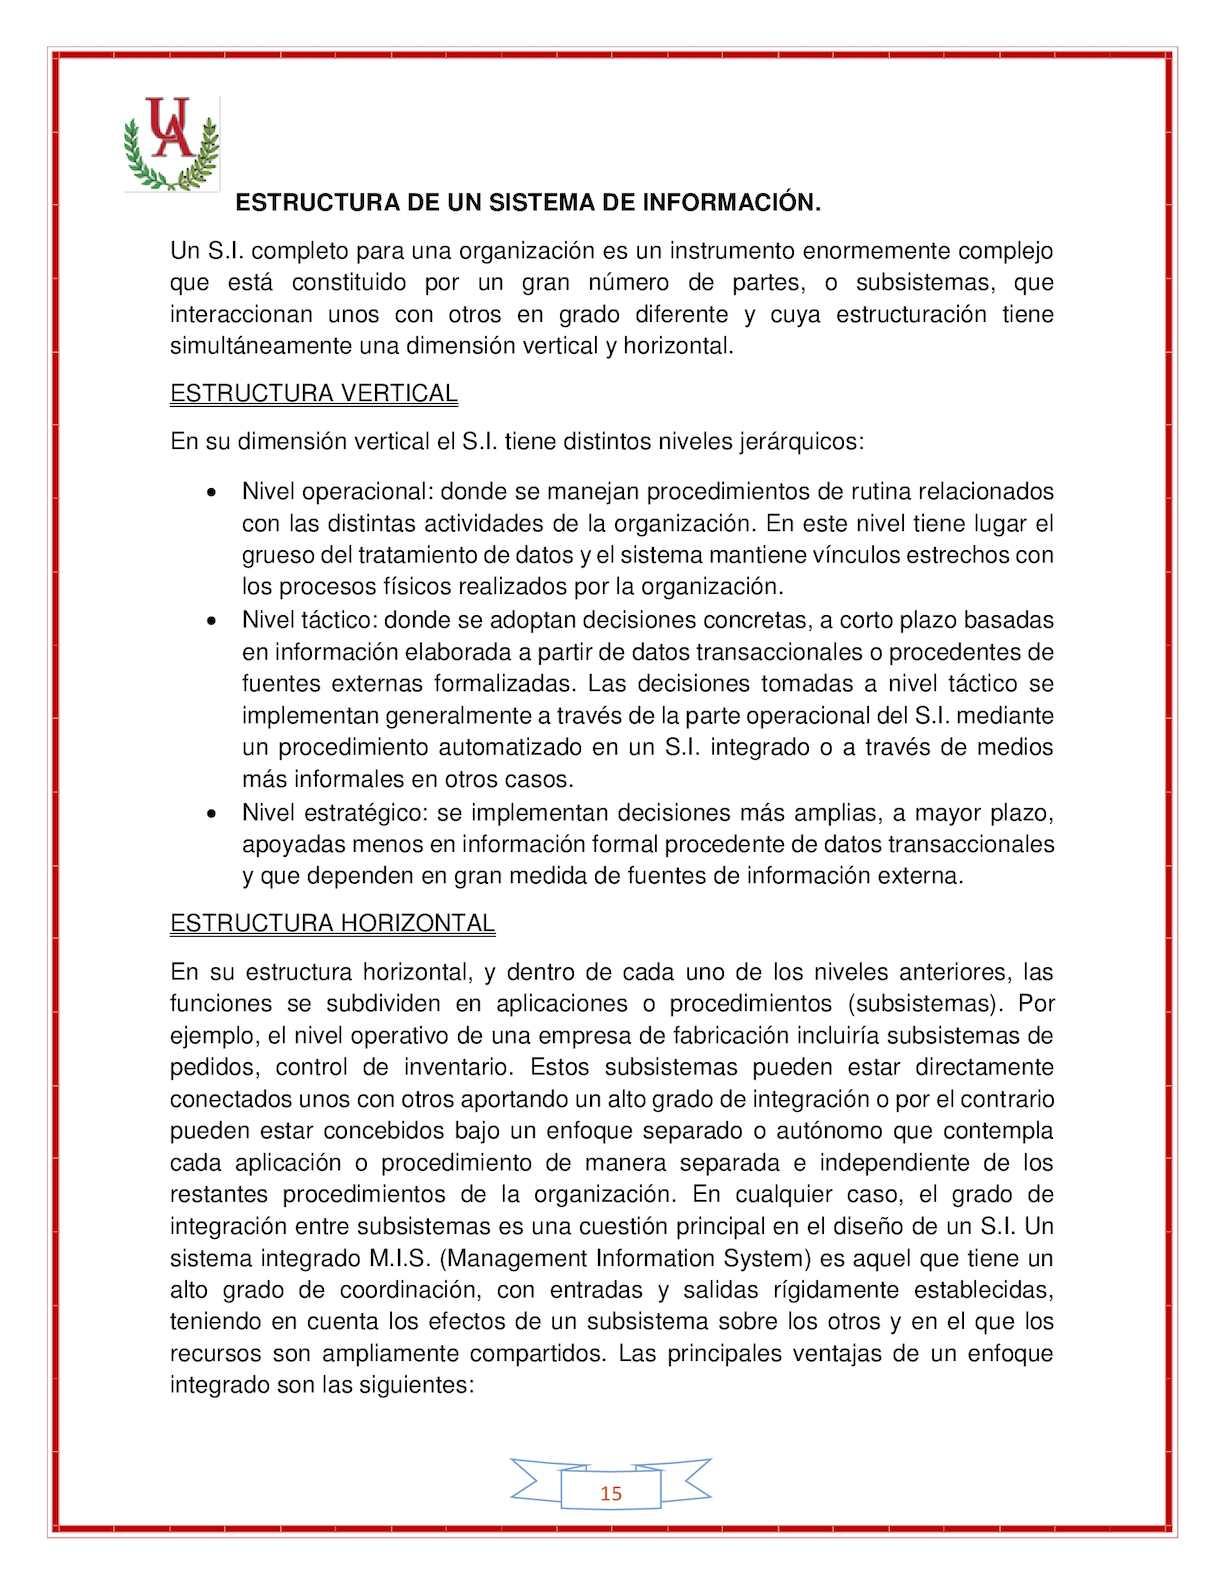 Antologia Derecho Informático Calameo Downloader